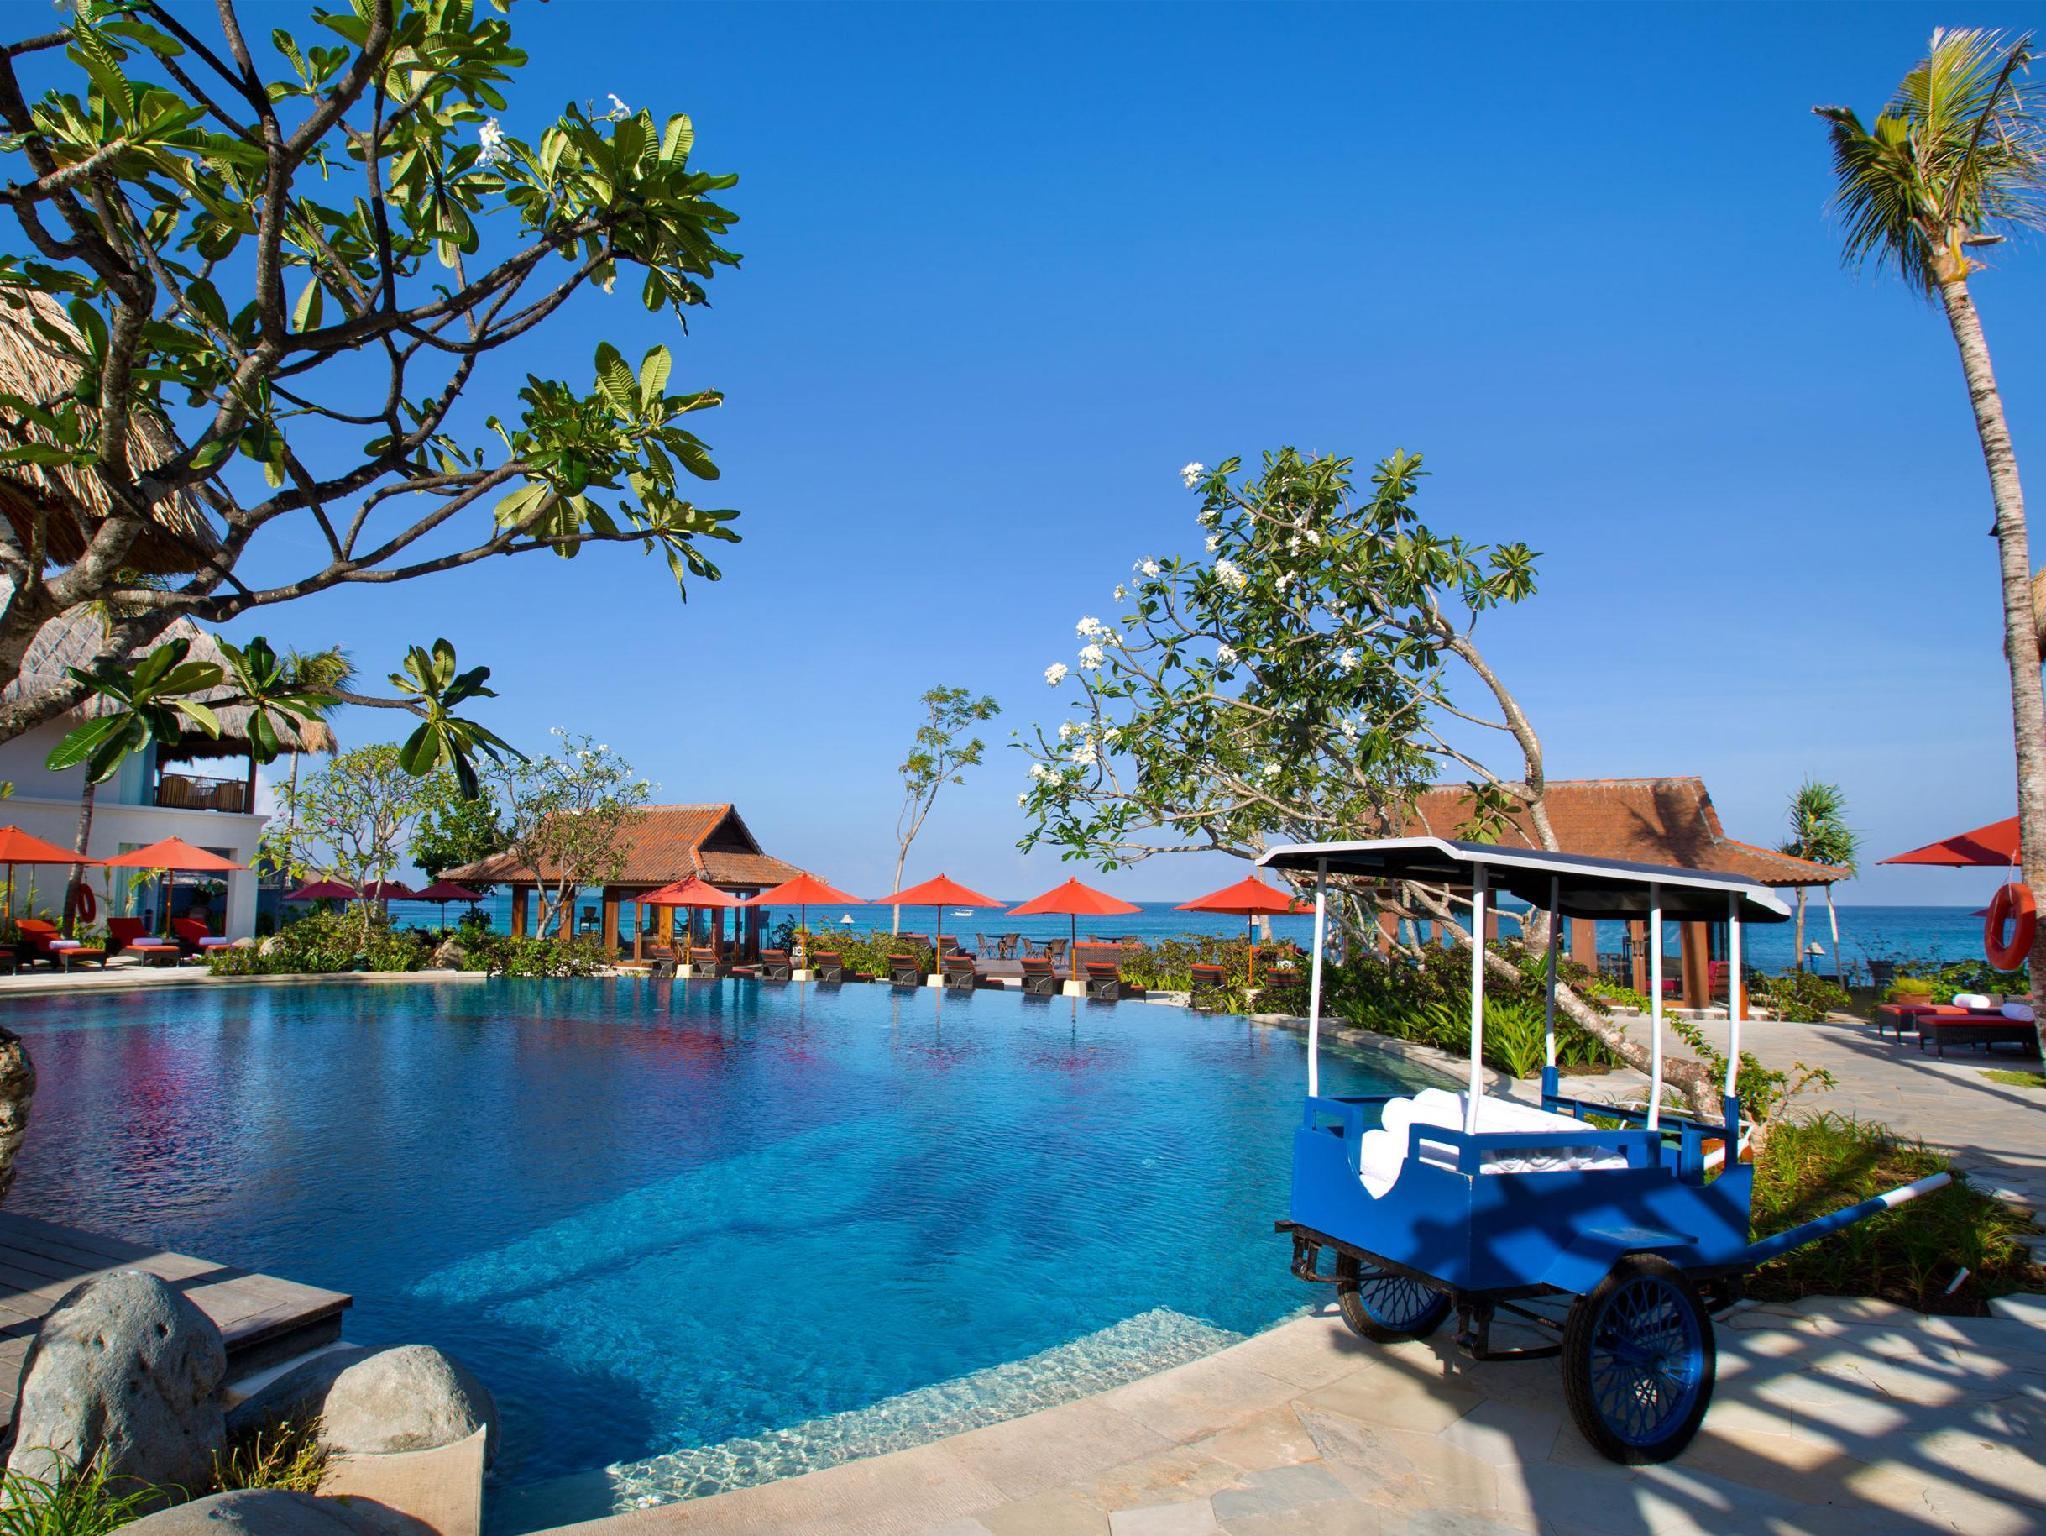 Sudamala Suites & Villas Senggigi - Hotels and Accommodation in Indonesia, Asia